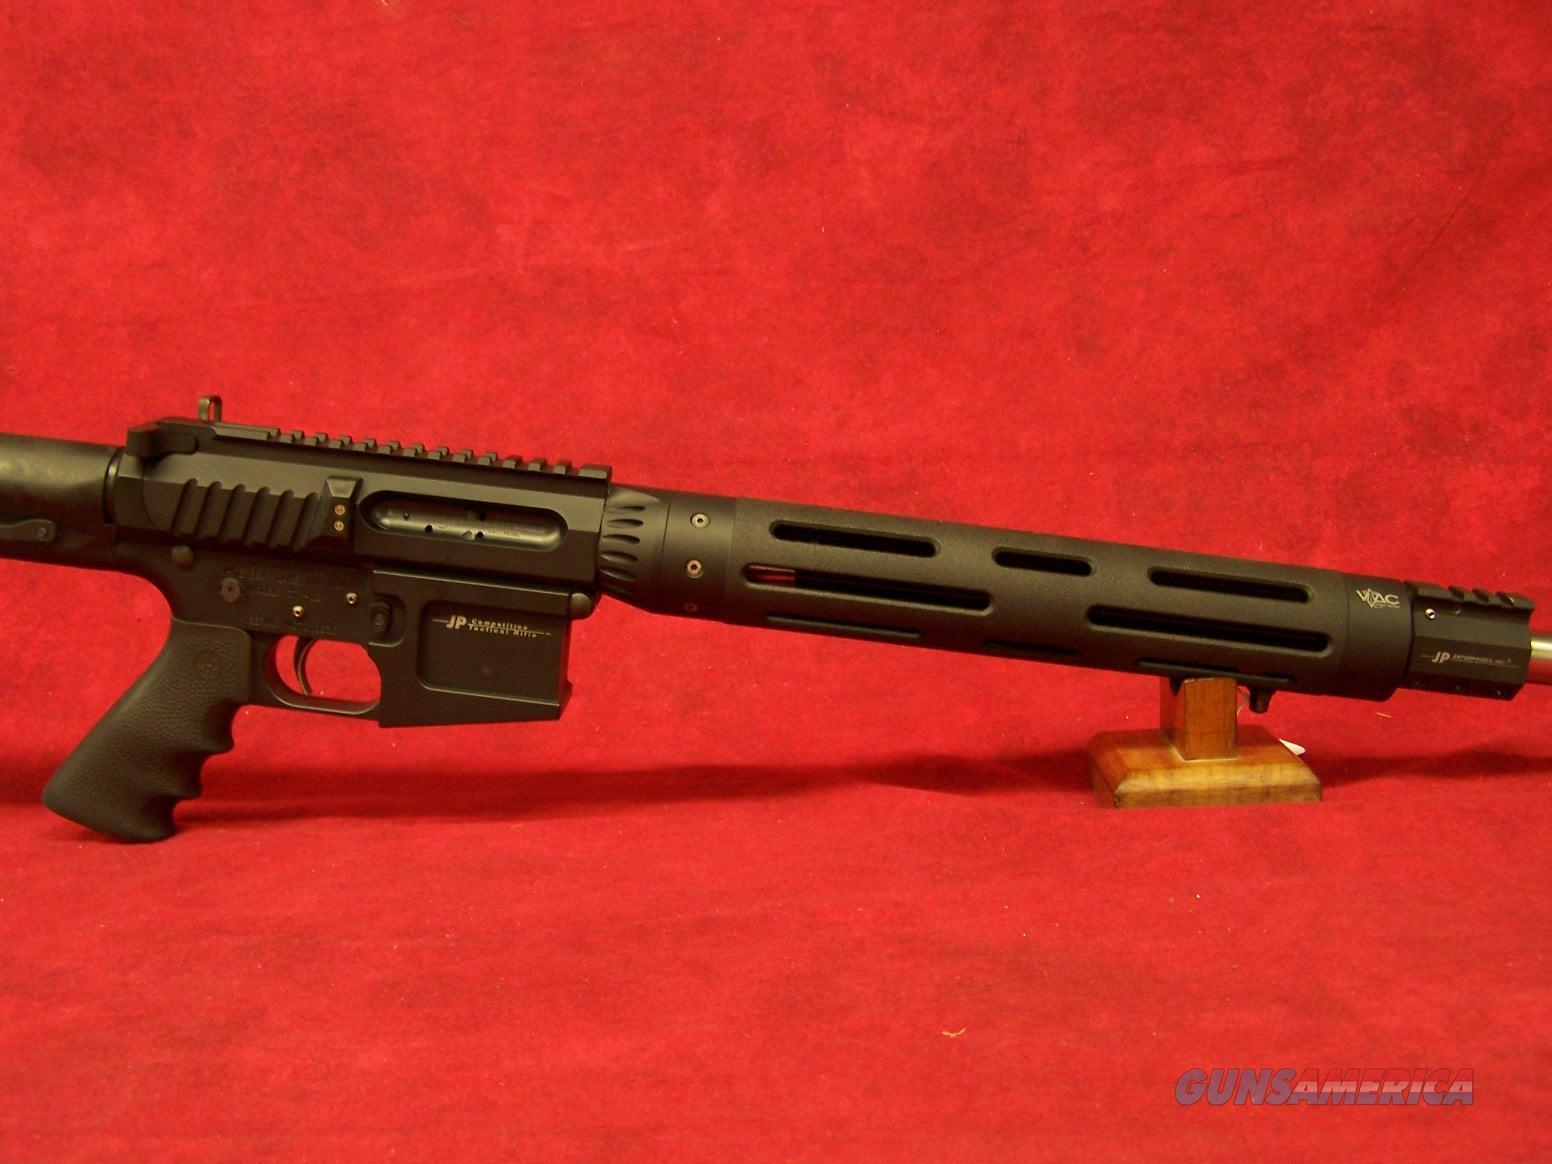 "J.P Enterprises CTR .204 22"" Barrel Magpul PRS Stock 1:12 twist VTAC Forearm (CTR-02)  Guns > Rifles > AR-15 Rifles - Small Manufacturers > Complete Rifle"